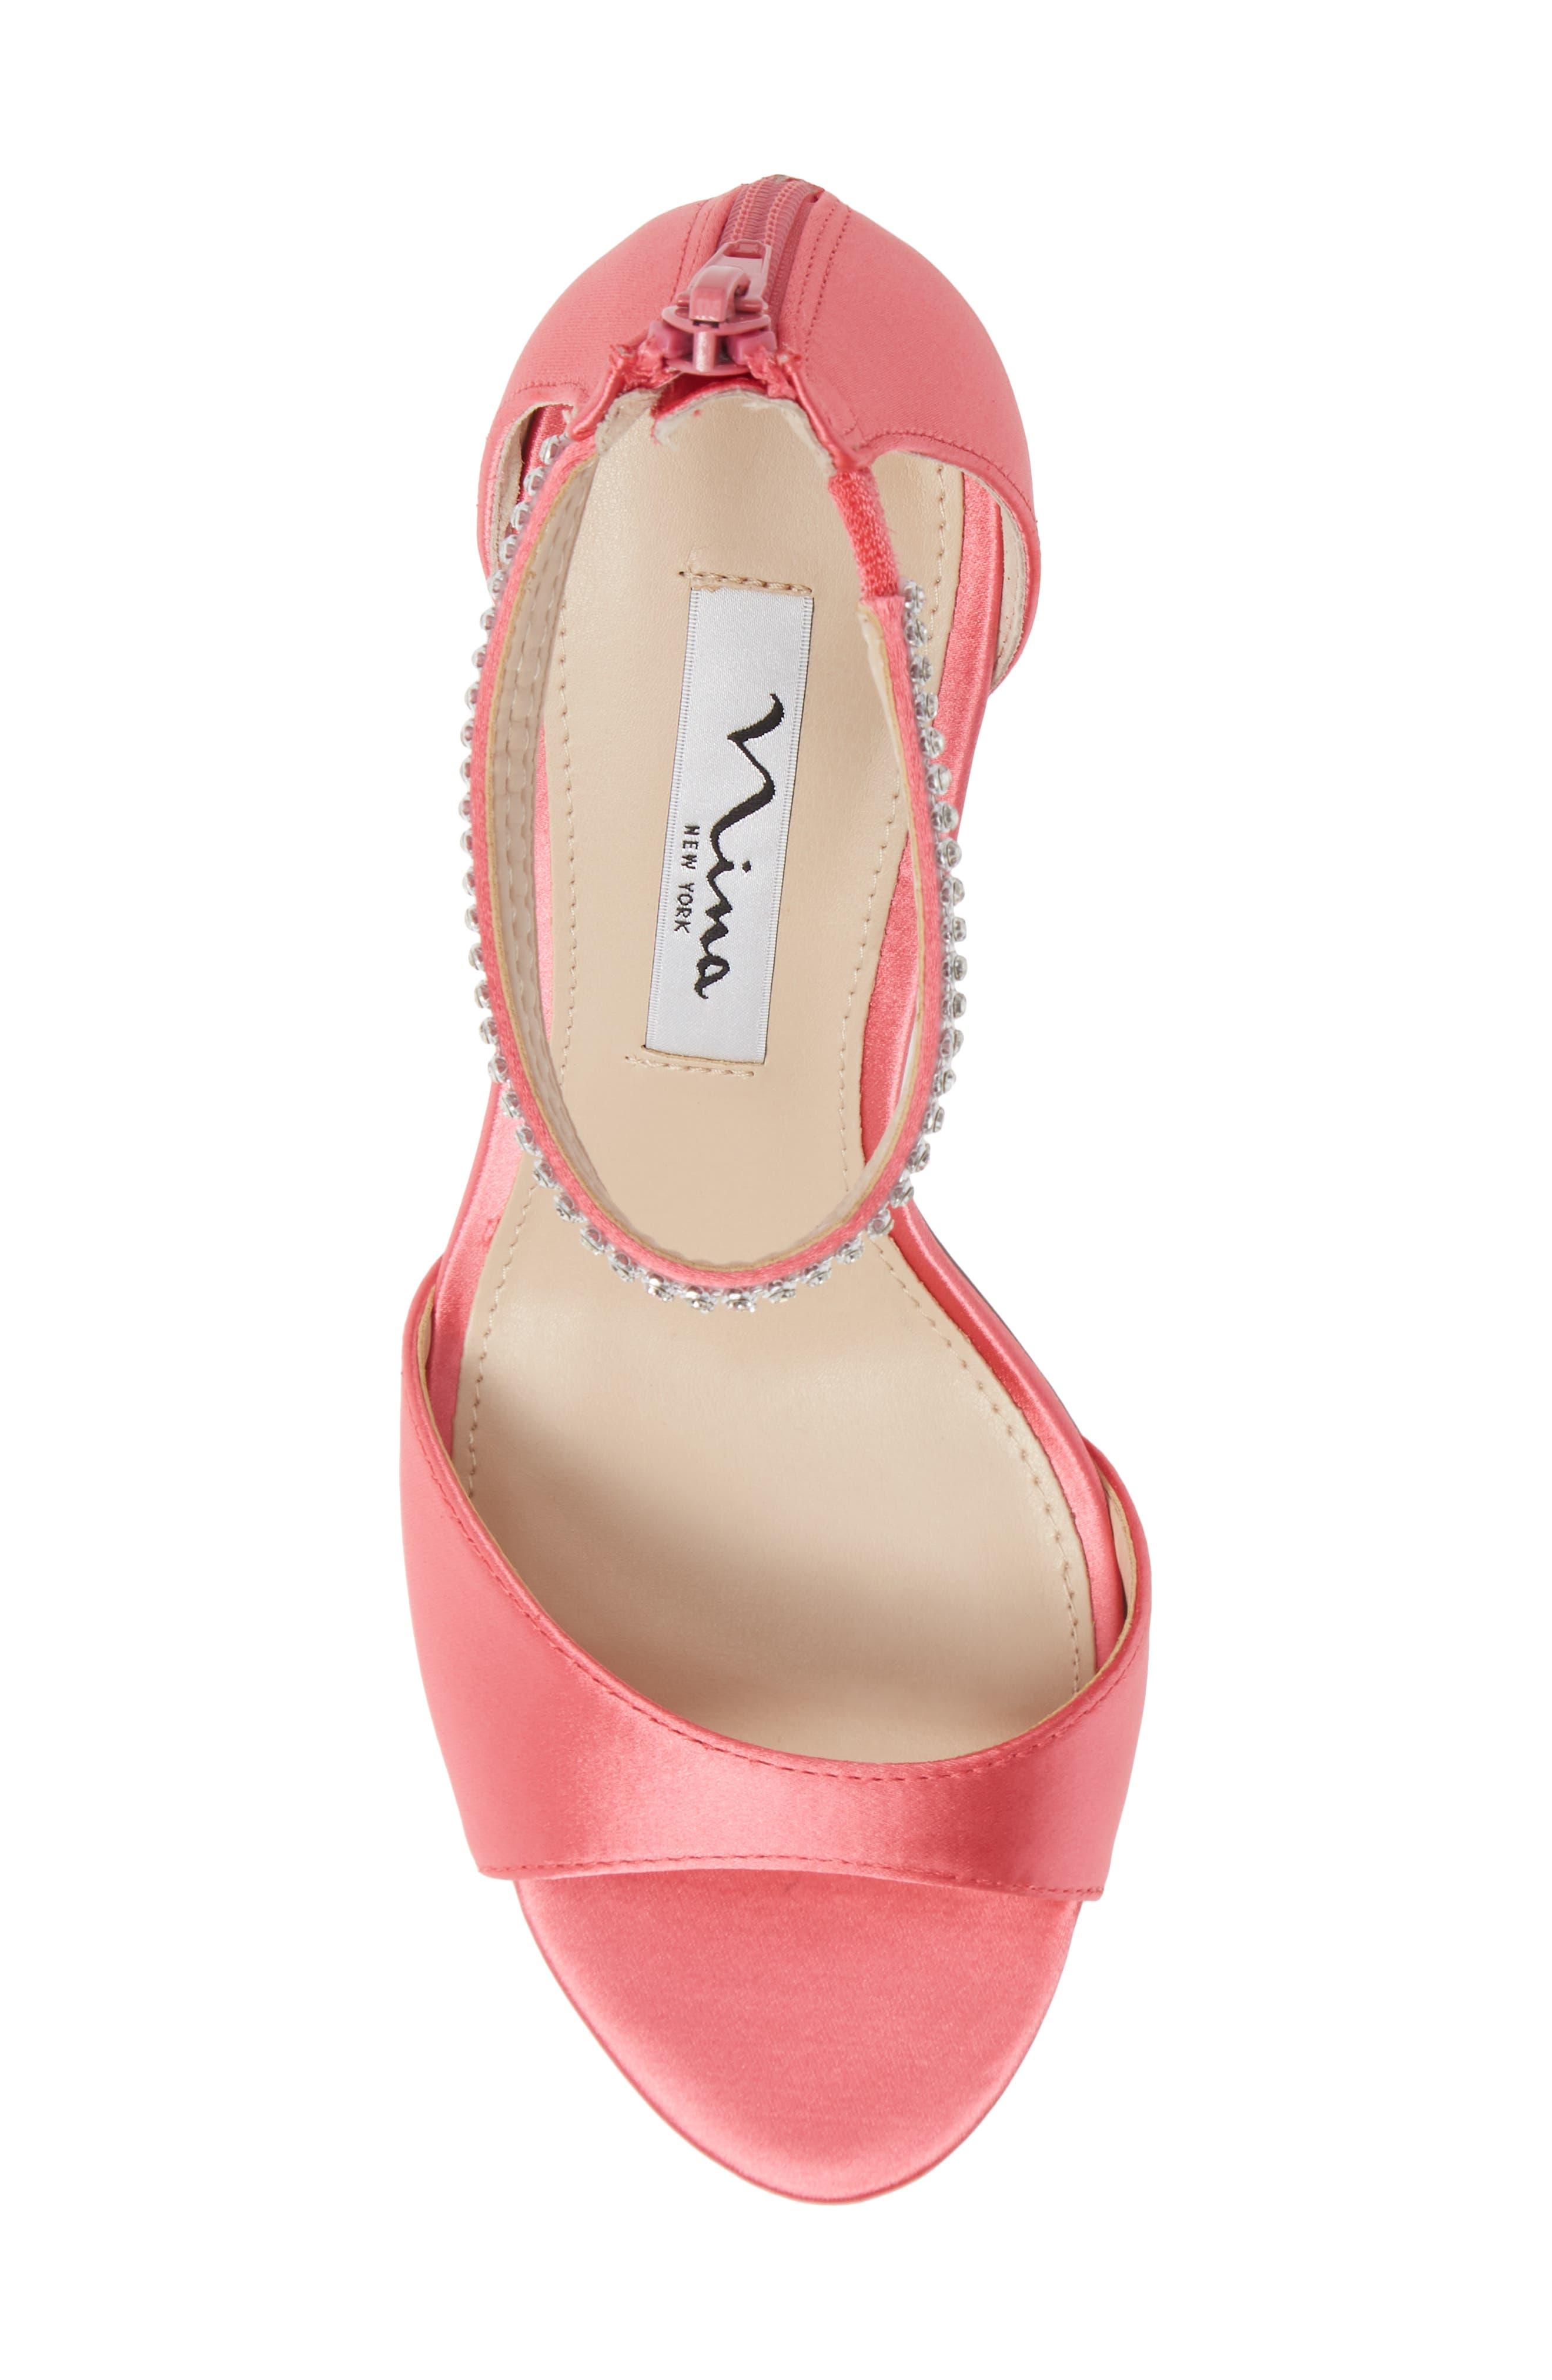 NINA, Volanda Ankle Strap Sandal, Alternate thumbnail 5, color, STRAWBERRY PUNCH SATIN